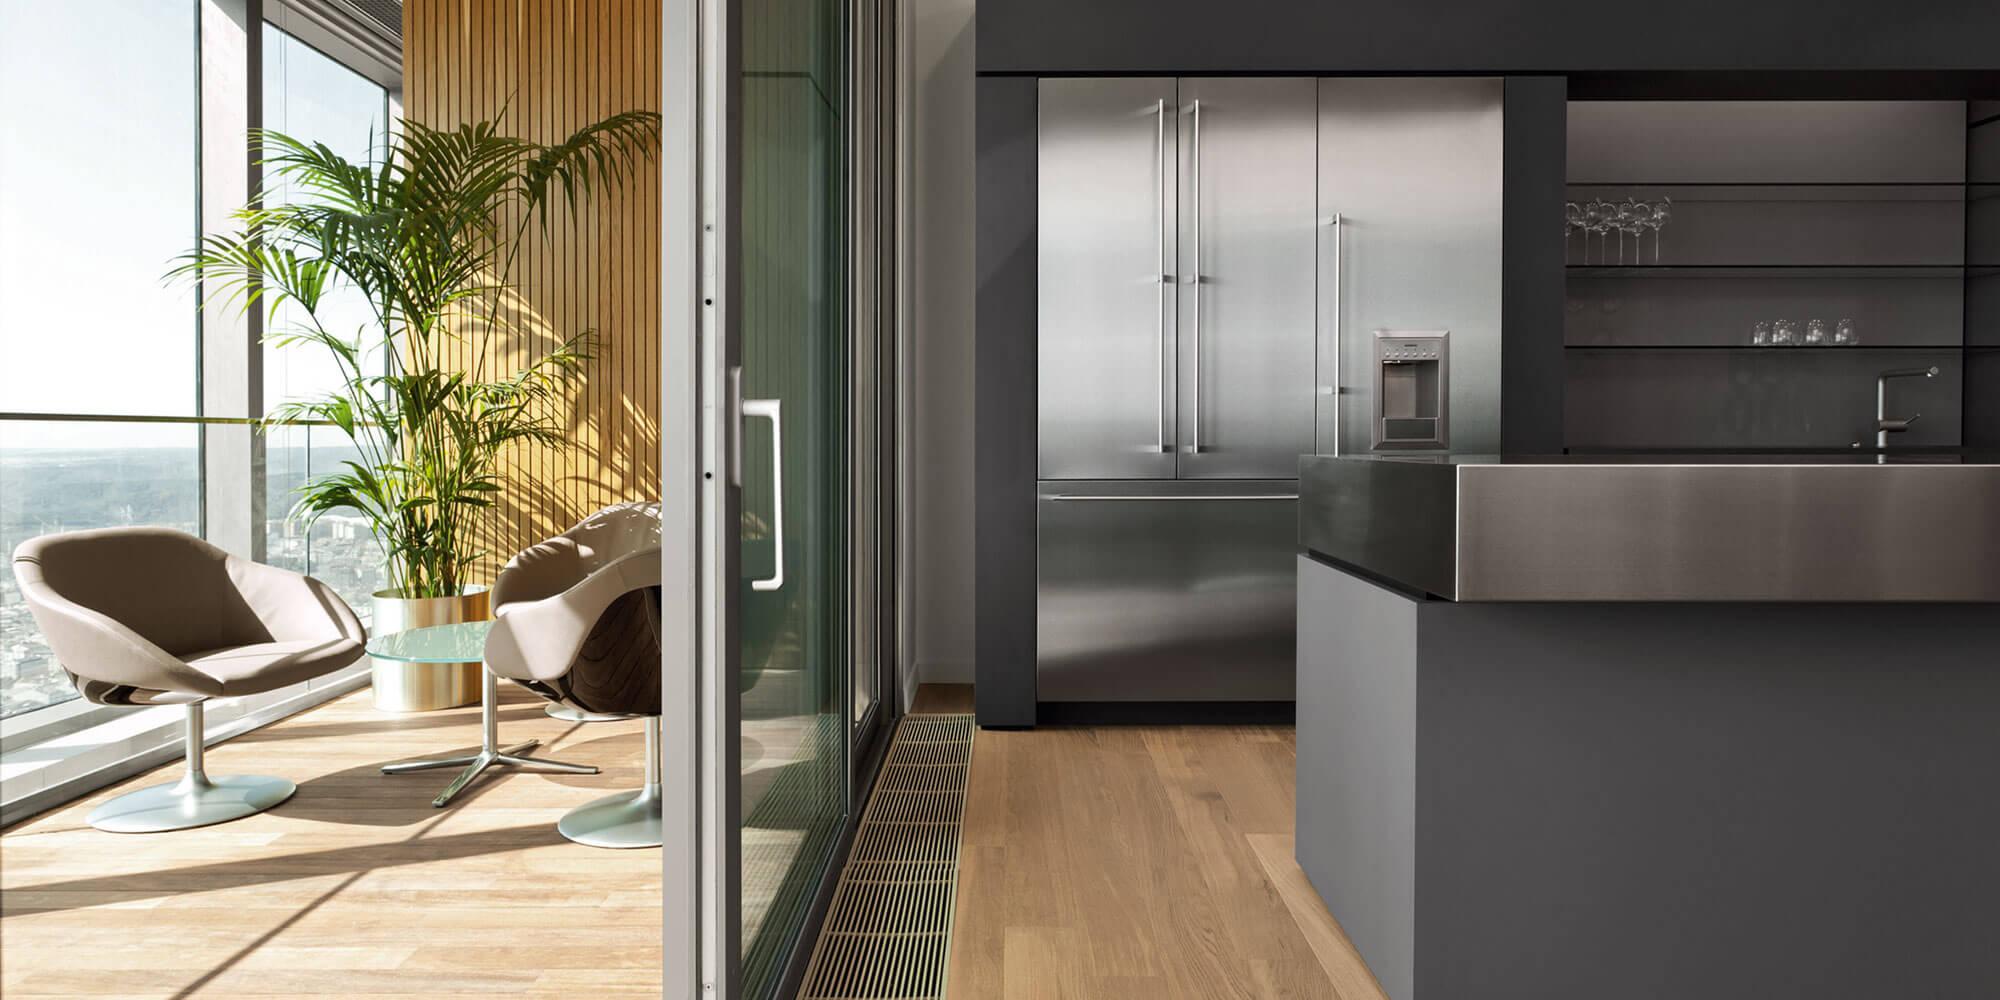 referenzen 2011 michael biehler k chen e k. Black Bedroom Furniture Sets. Home Design Ideas